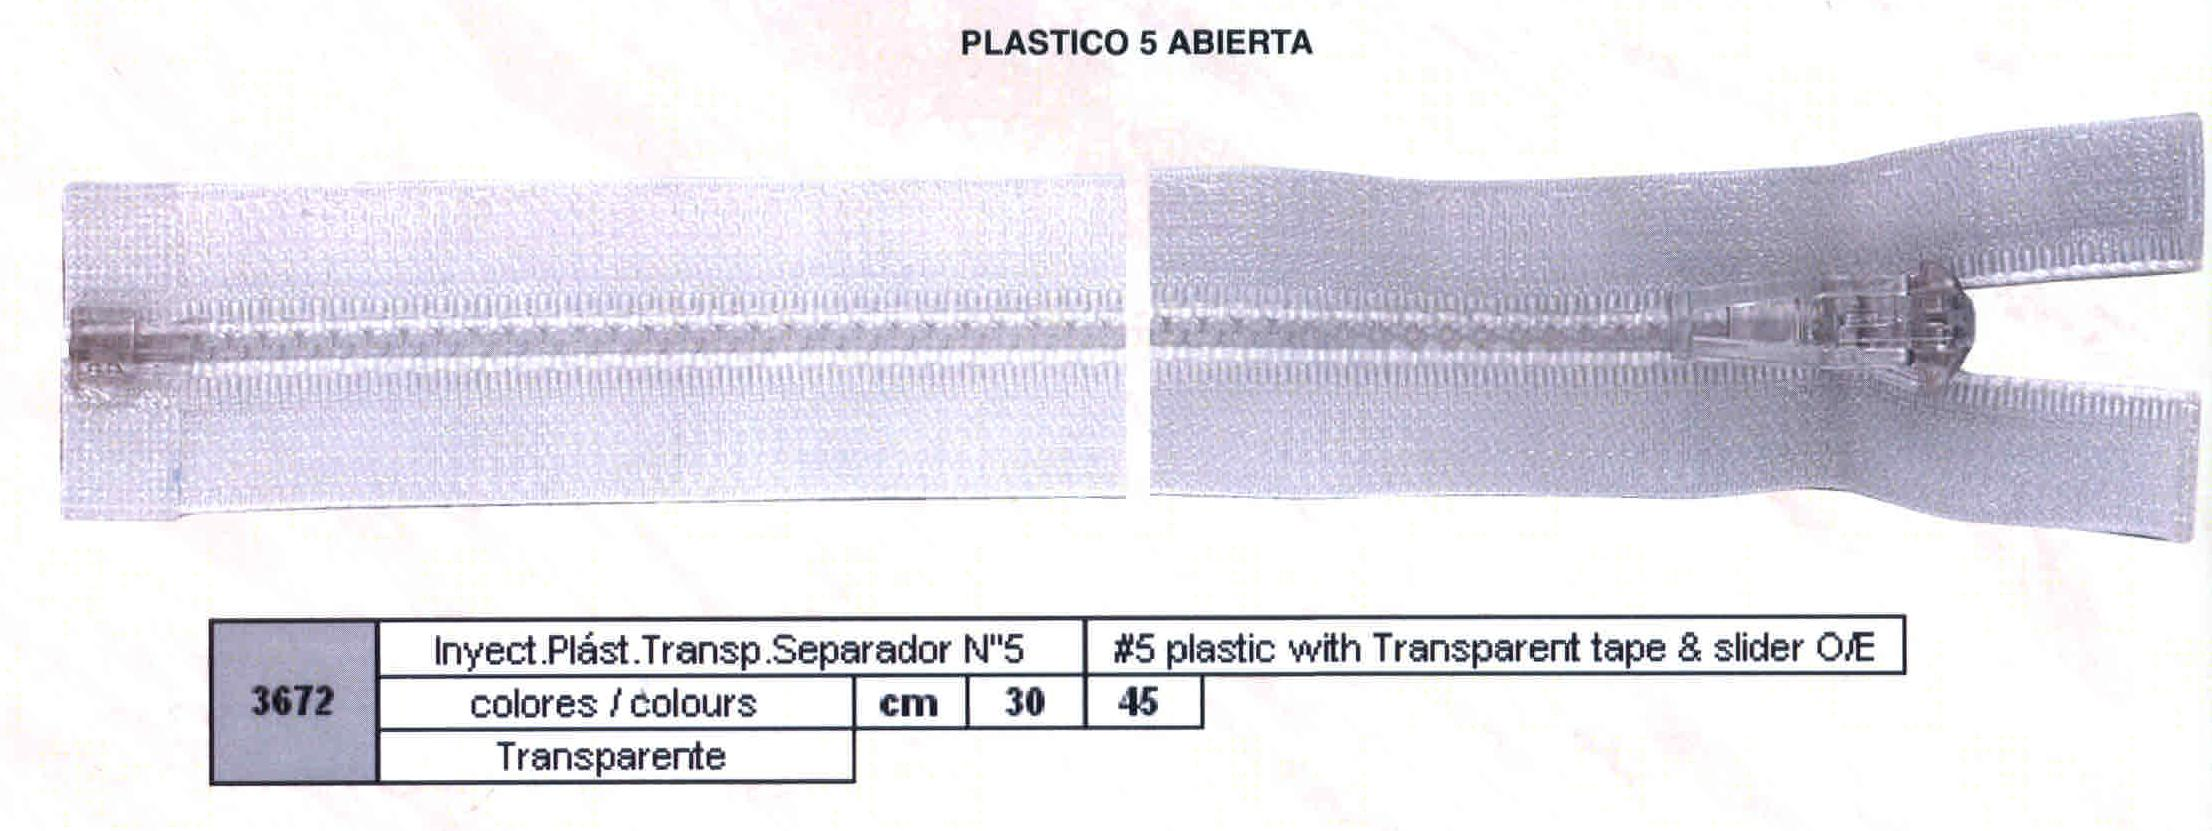 Cremallera SNS Plástico Transparente Separador num. 5